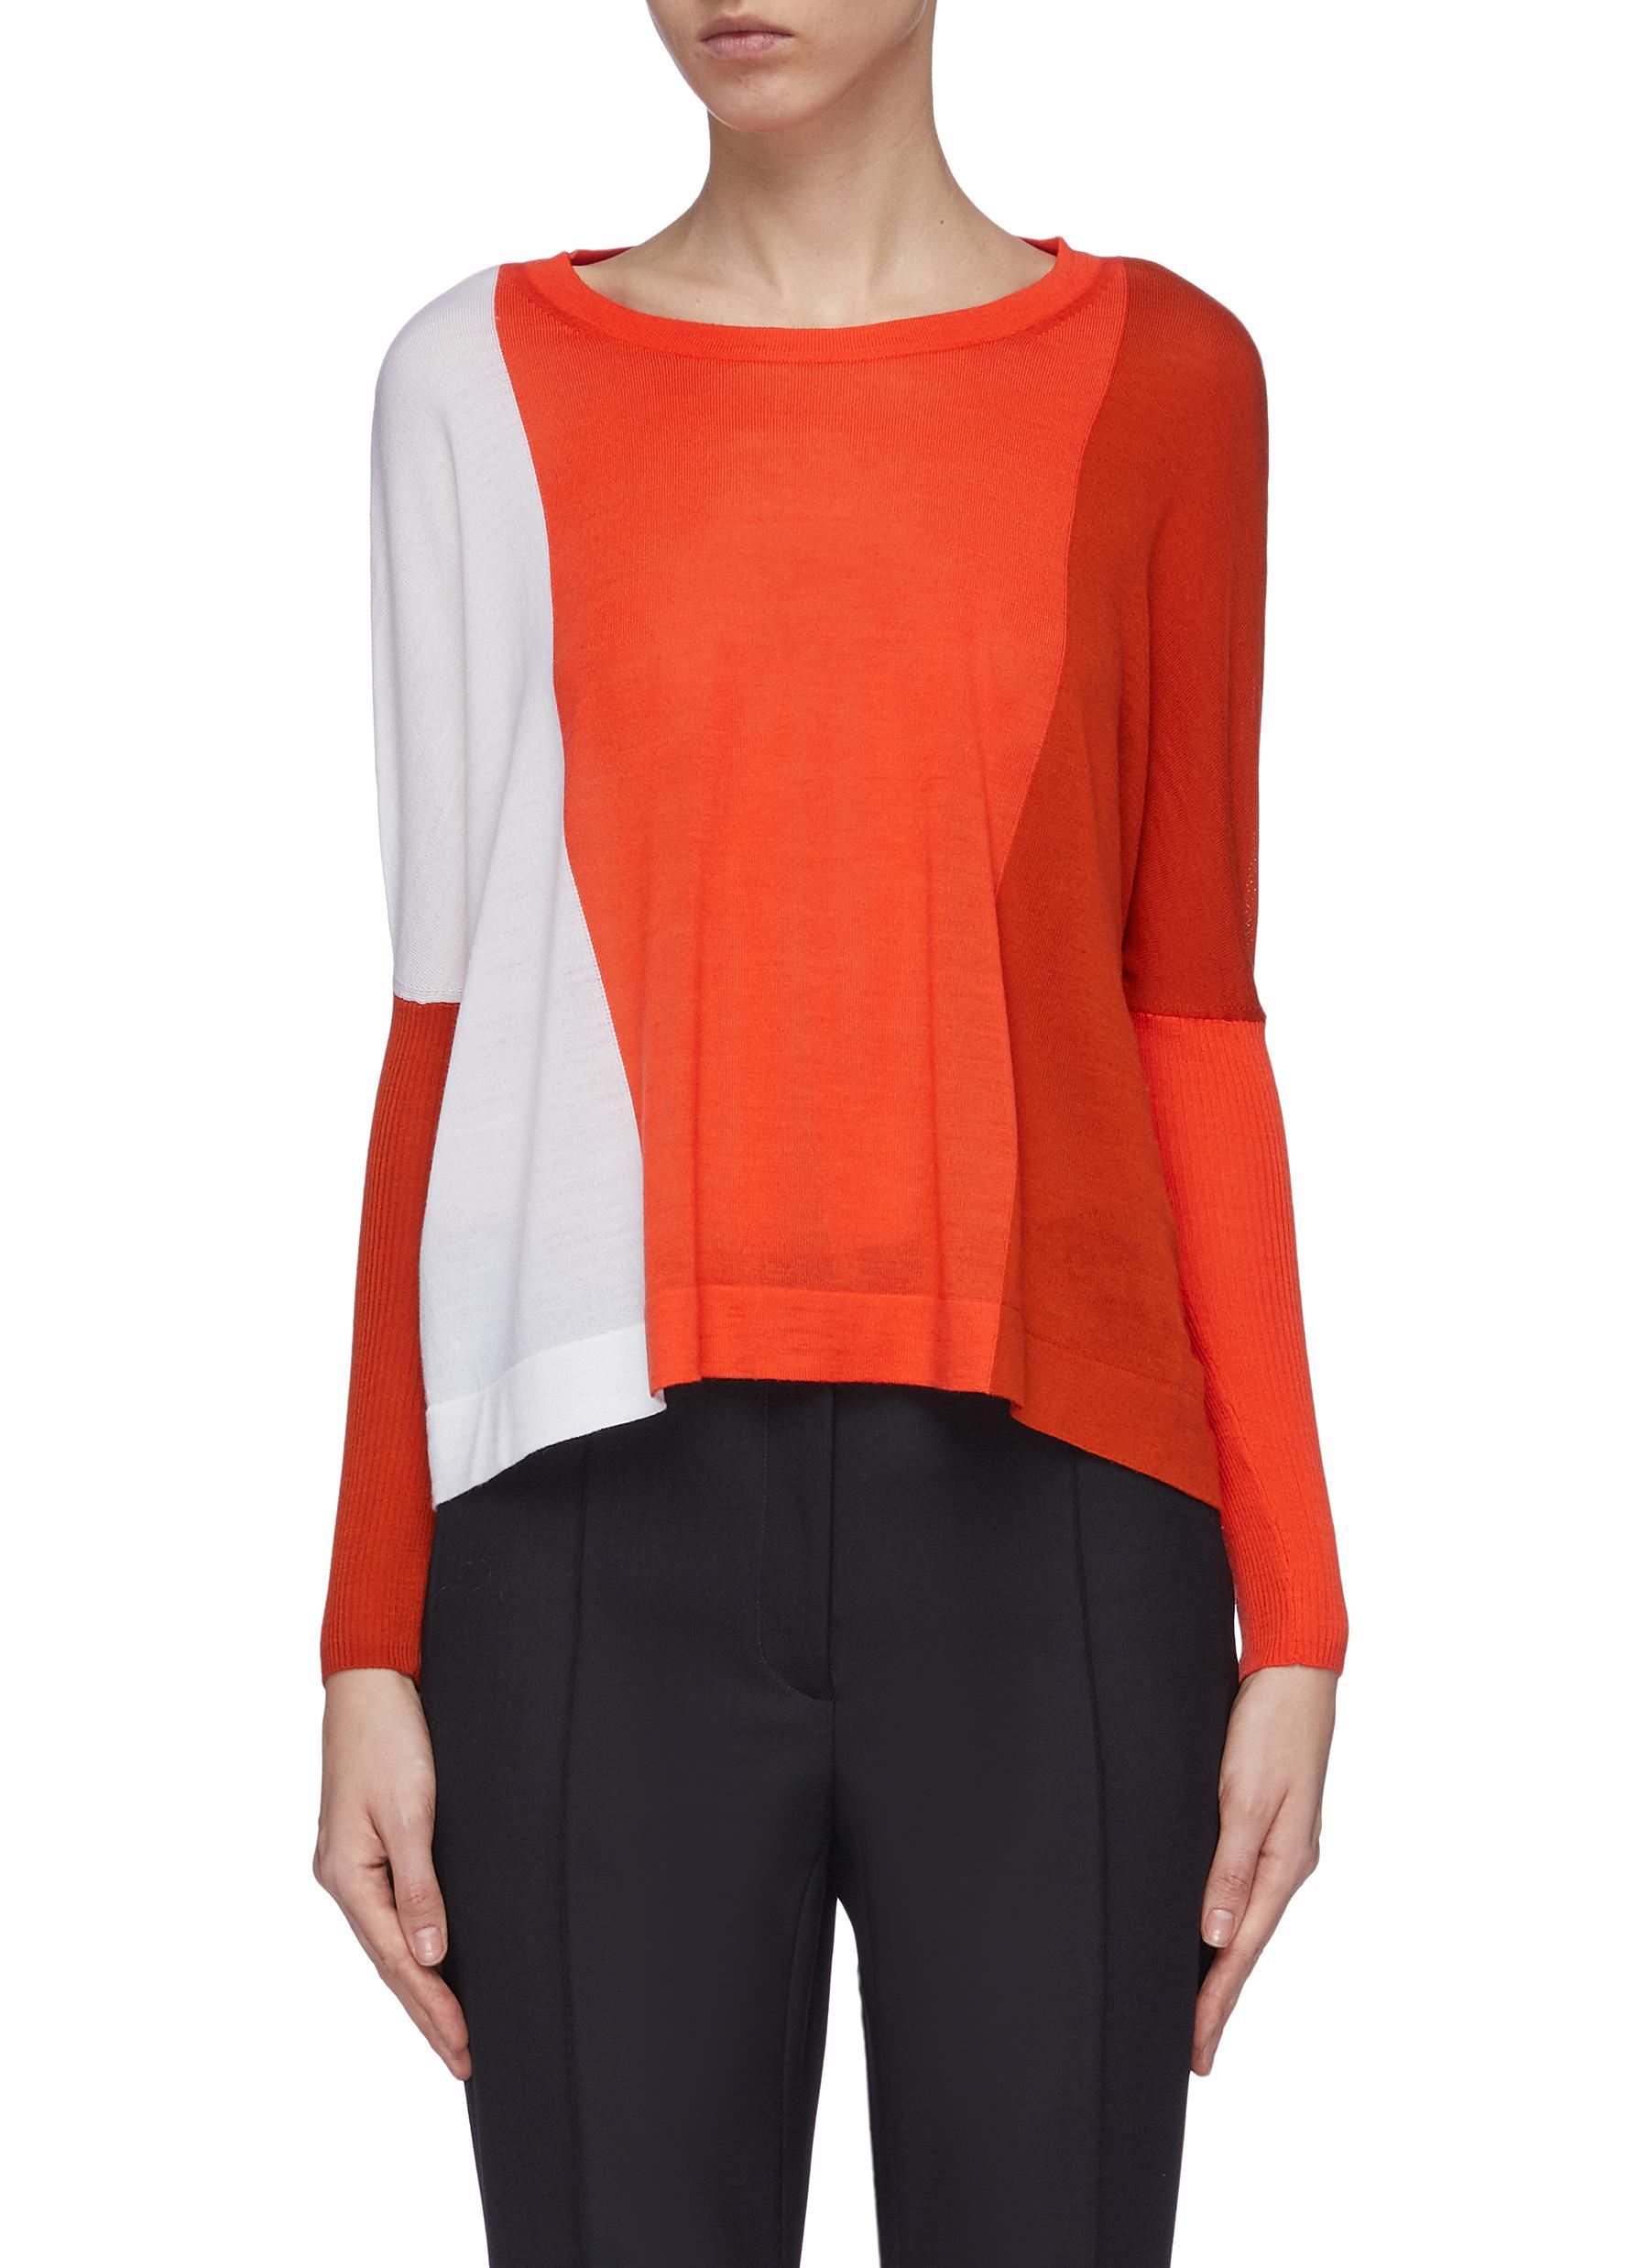 Danna dolman sleeve colourblock boxy Merino wool sweater by Diane Von Furstenberg